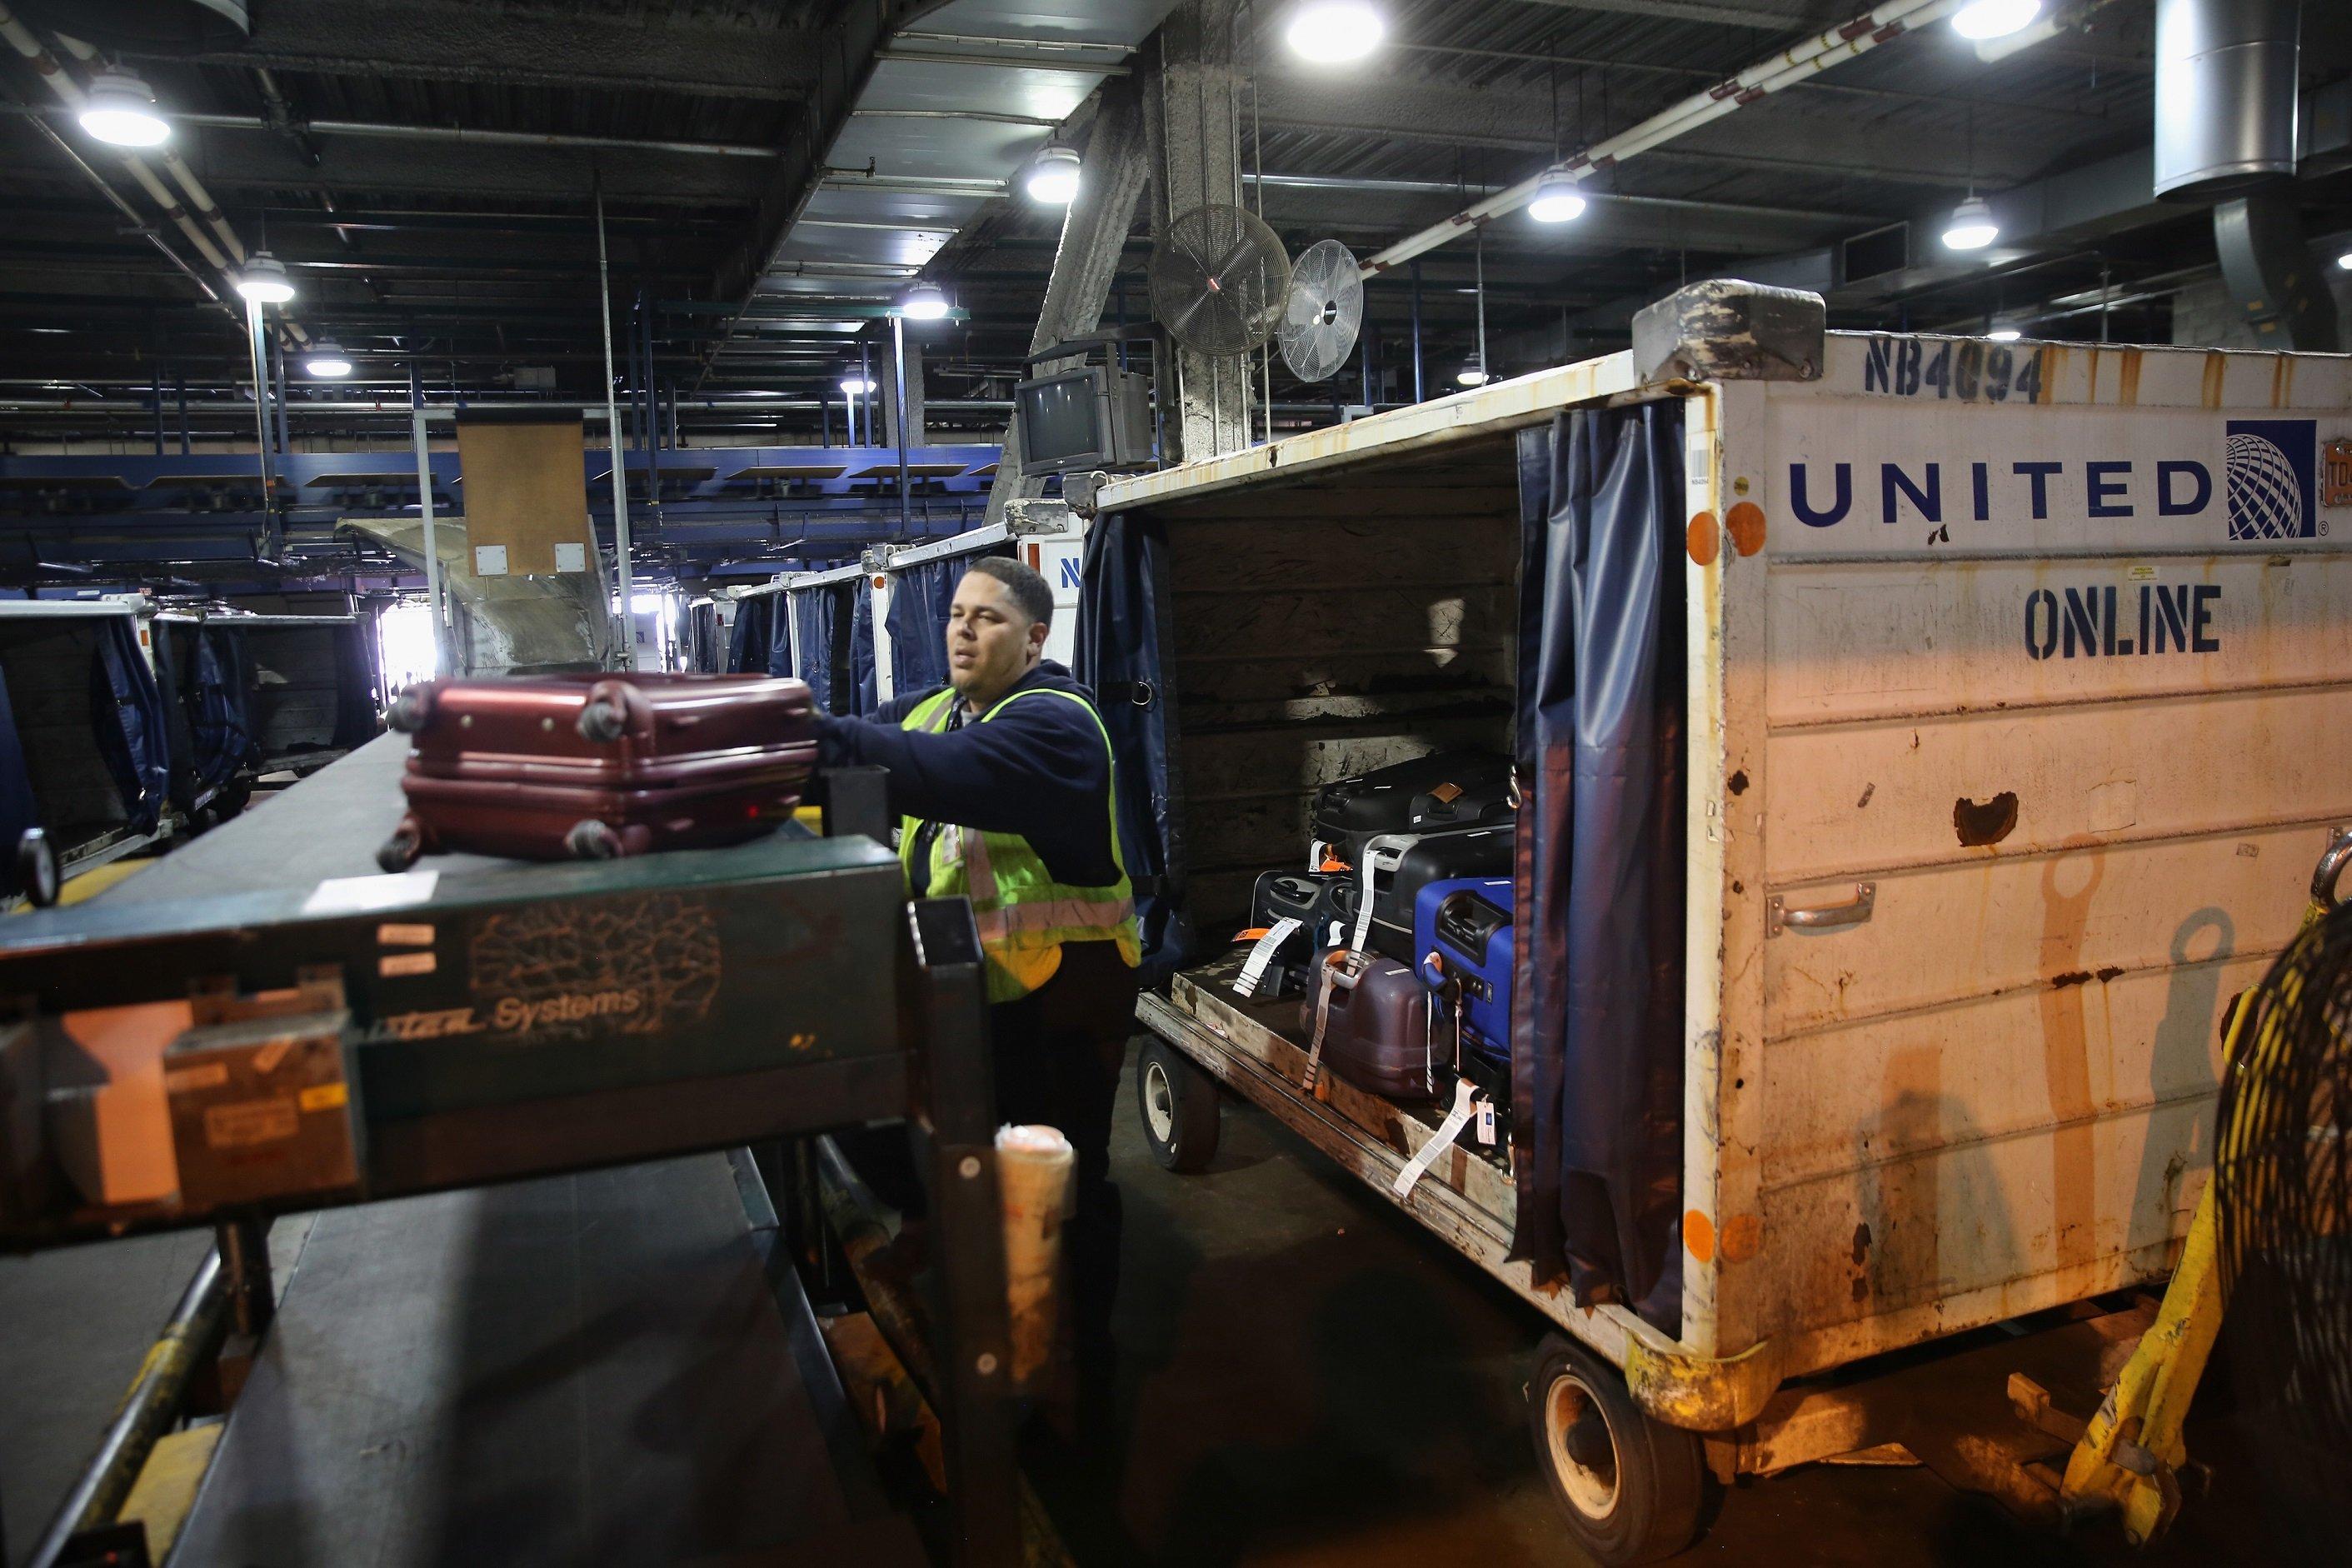 Baggage Handler loading luggage